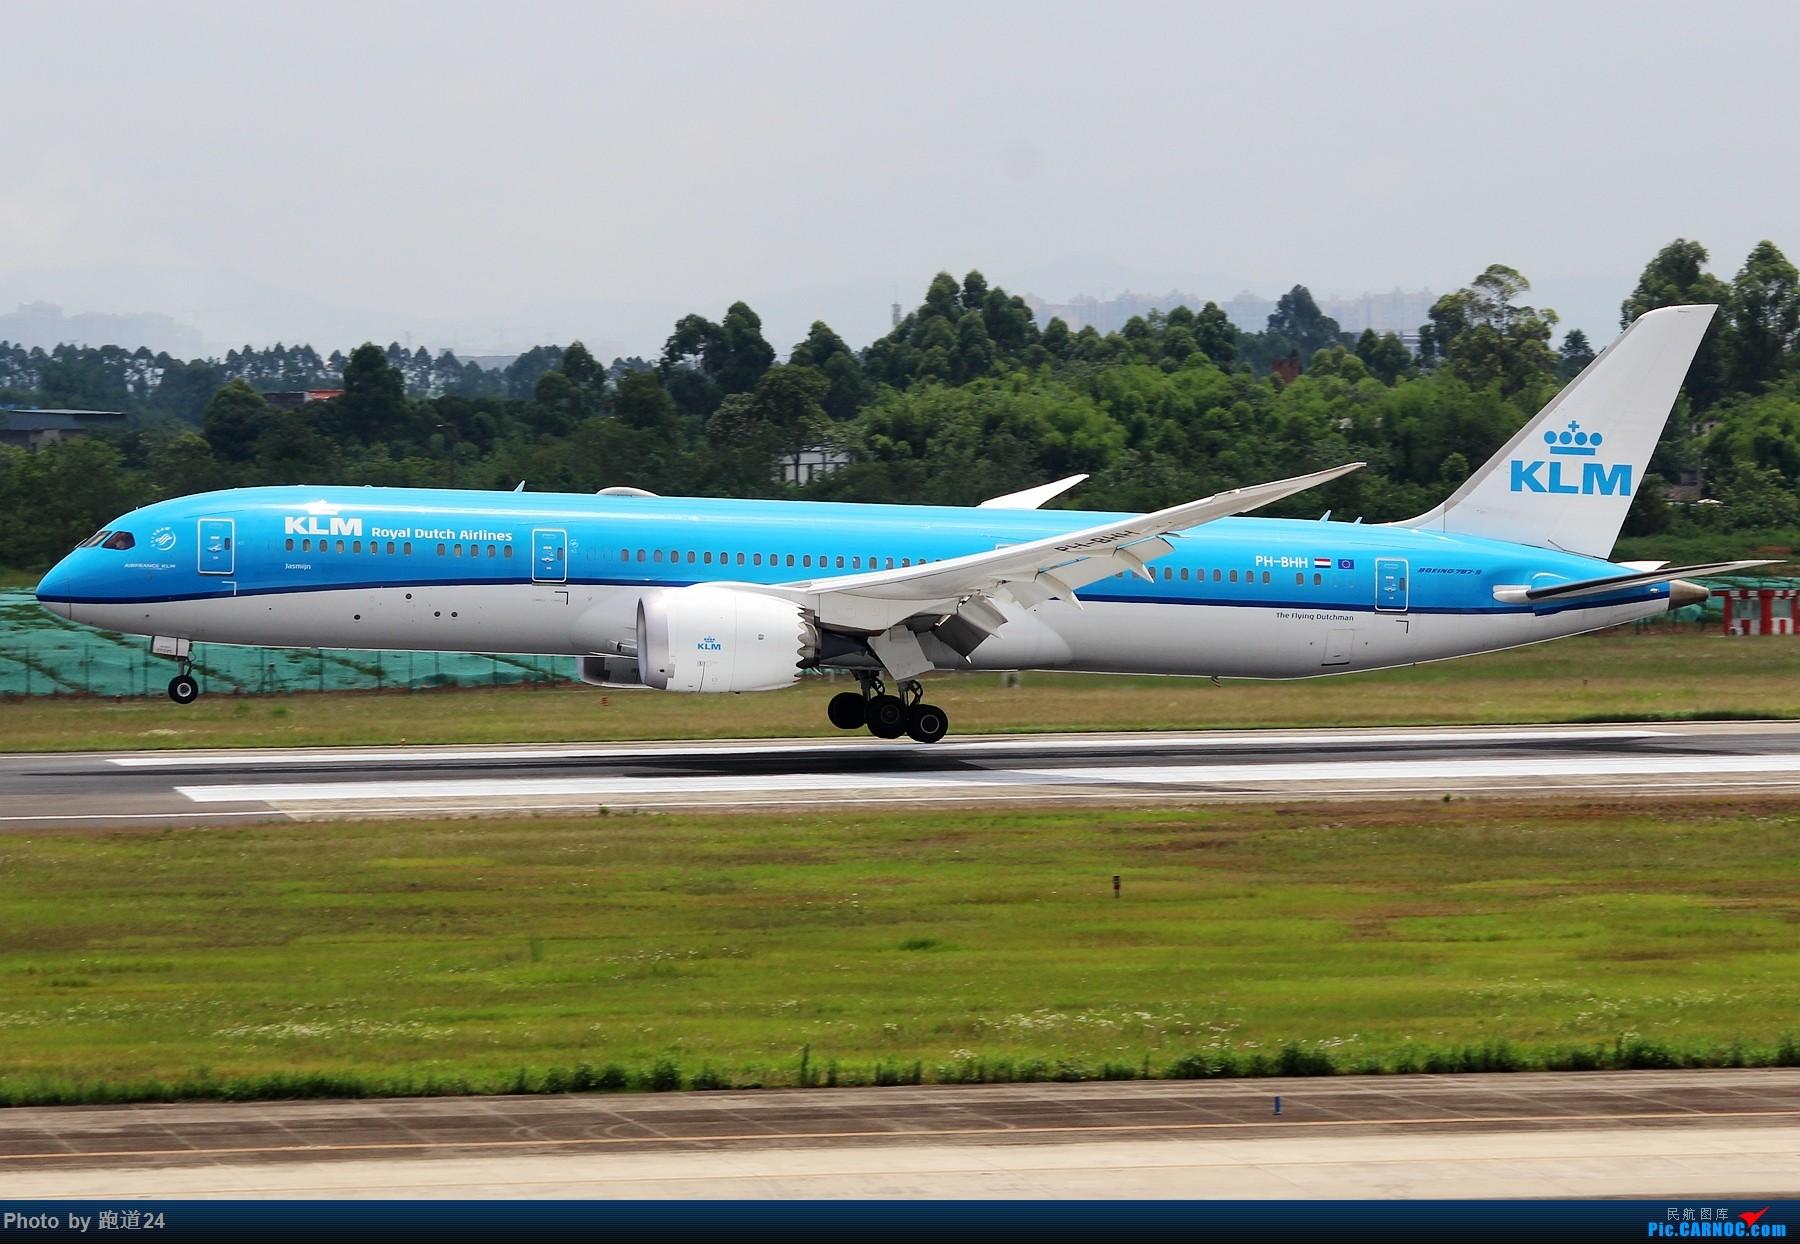 Re:[原创]【多图党】6月18日成都拍机【埃塞俄比亚航空B777-200LR】 BOEING 787-9 PH-BHH 中国成都双流国际机场